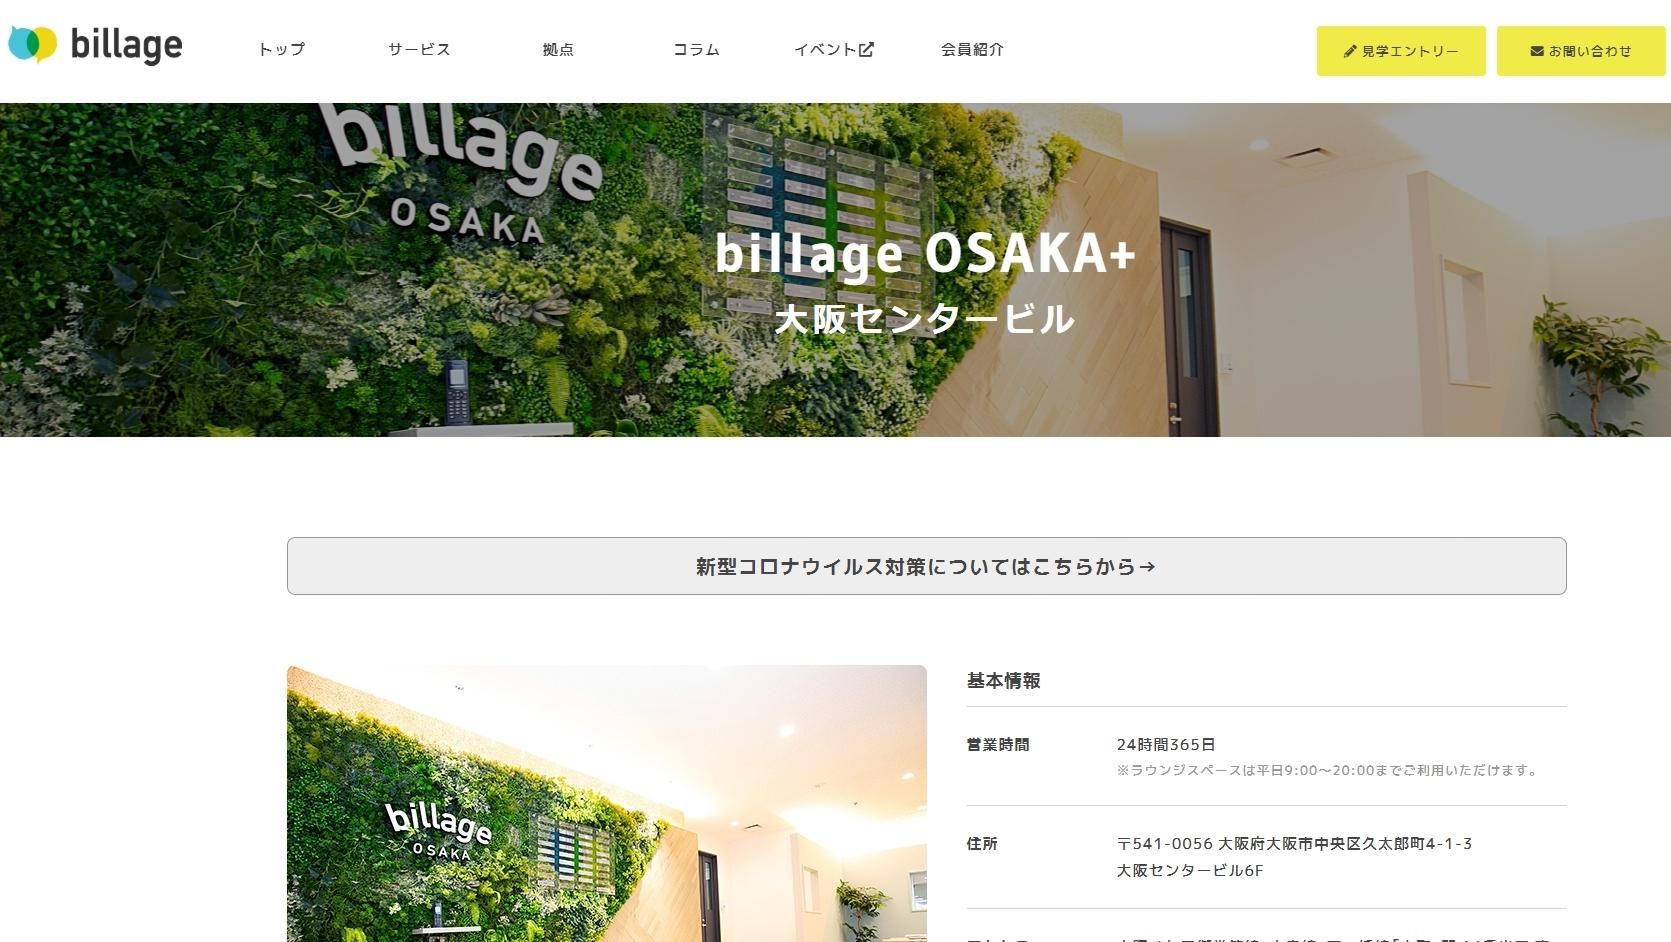 billage OSAKA+ 大阪センタービルの利用料金&アクセス紹介、大阪市 ...